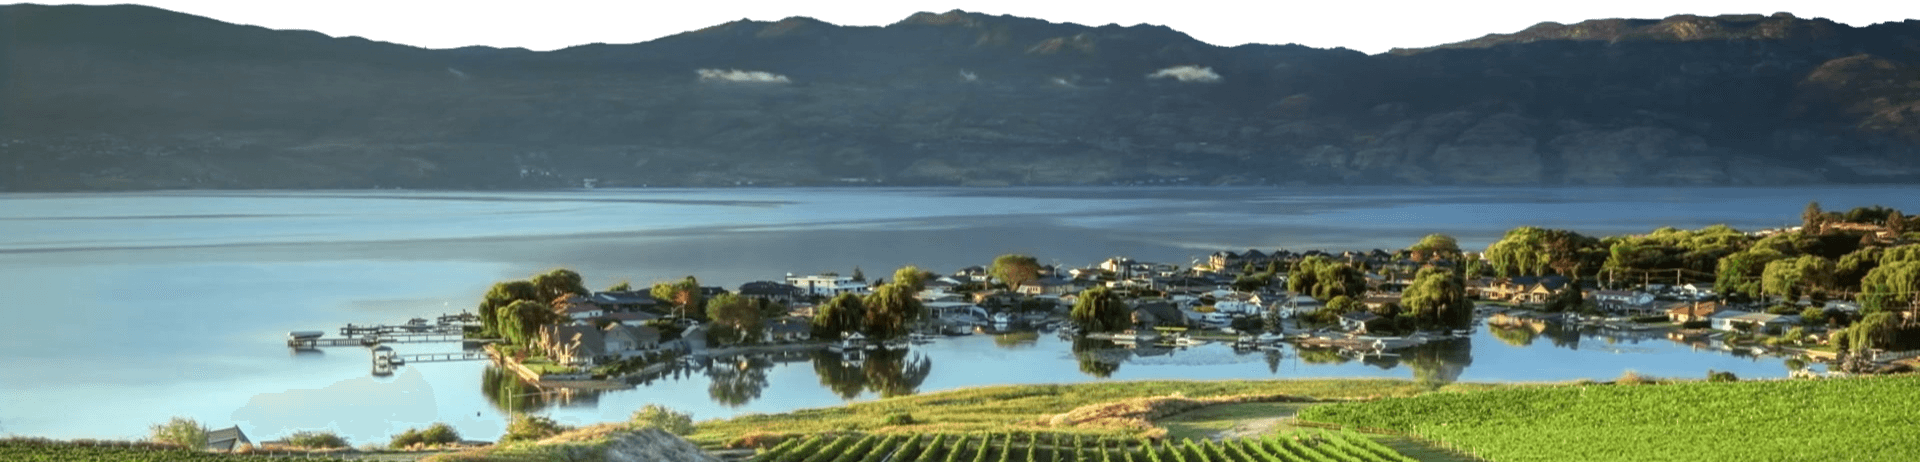 Kelowna - Okanagan Lake Background